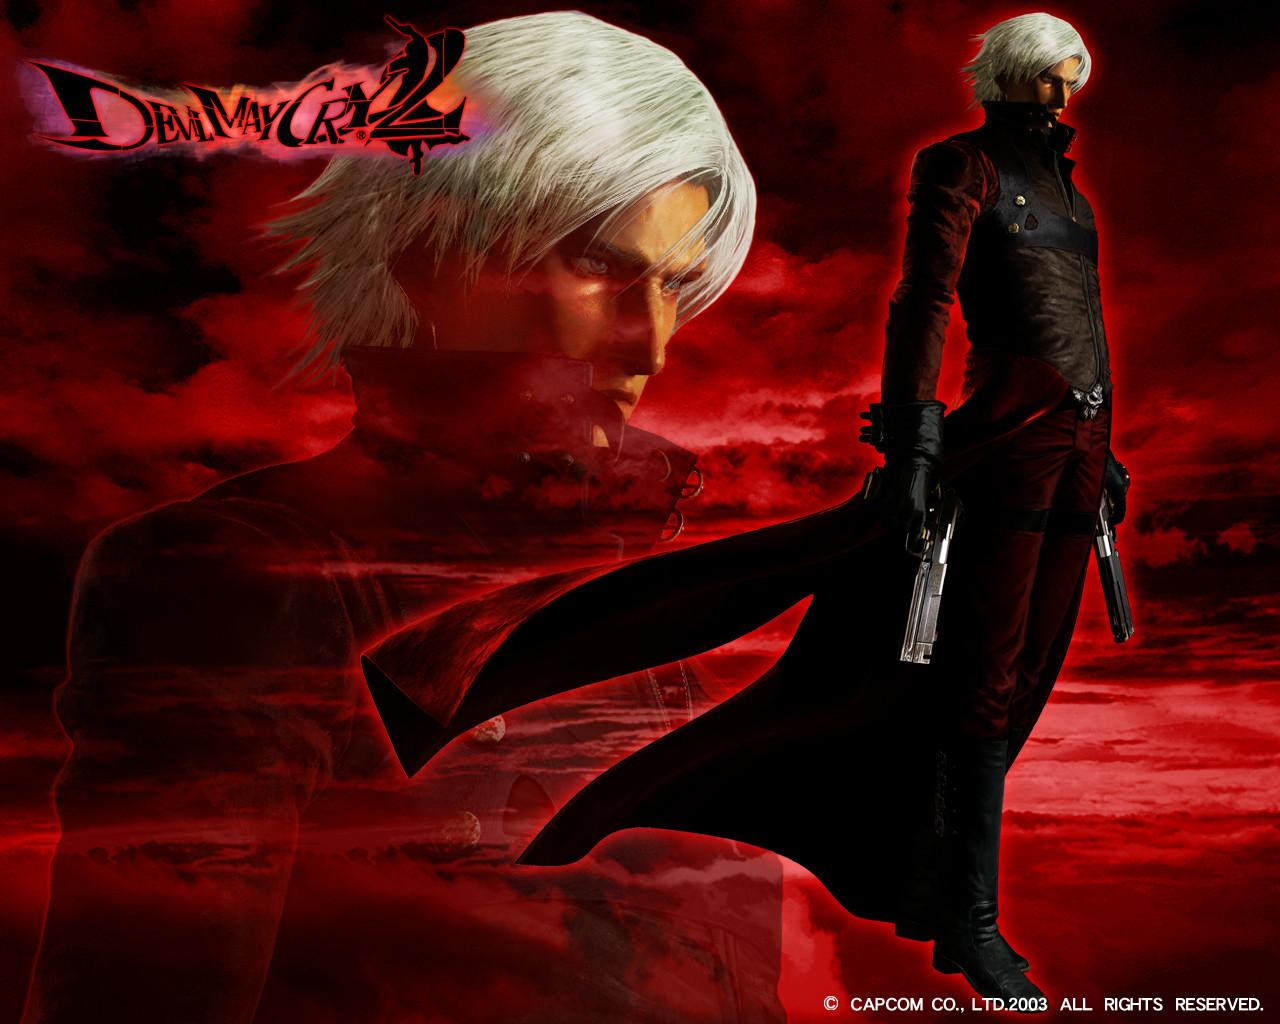 Devil May Cry Dante Wallpaper: Benjamin Saga: Devil May Cry Images And Wallpapers